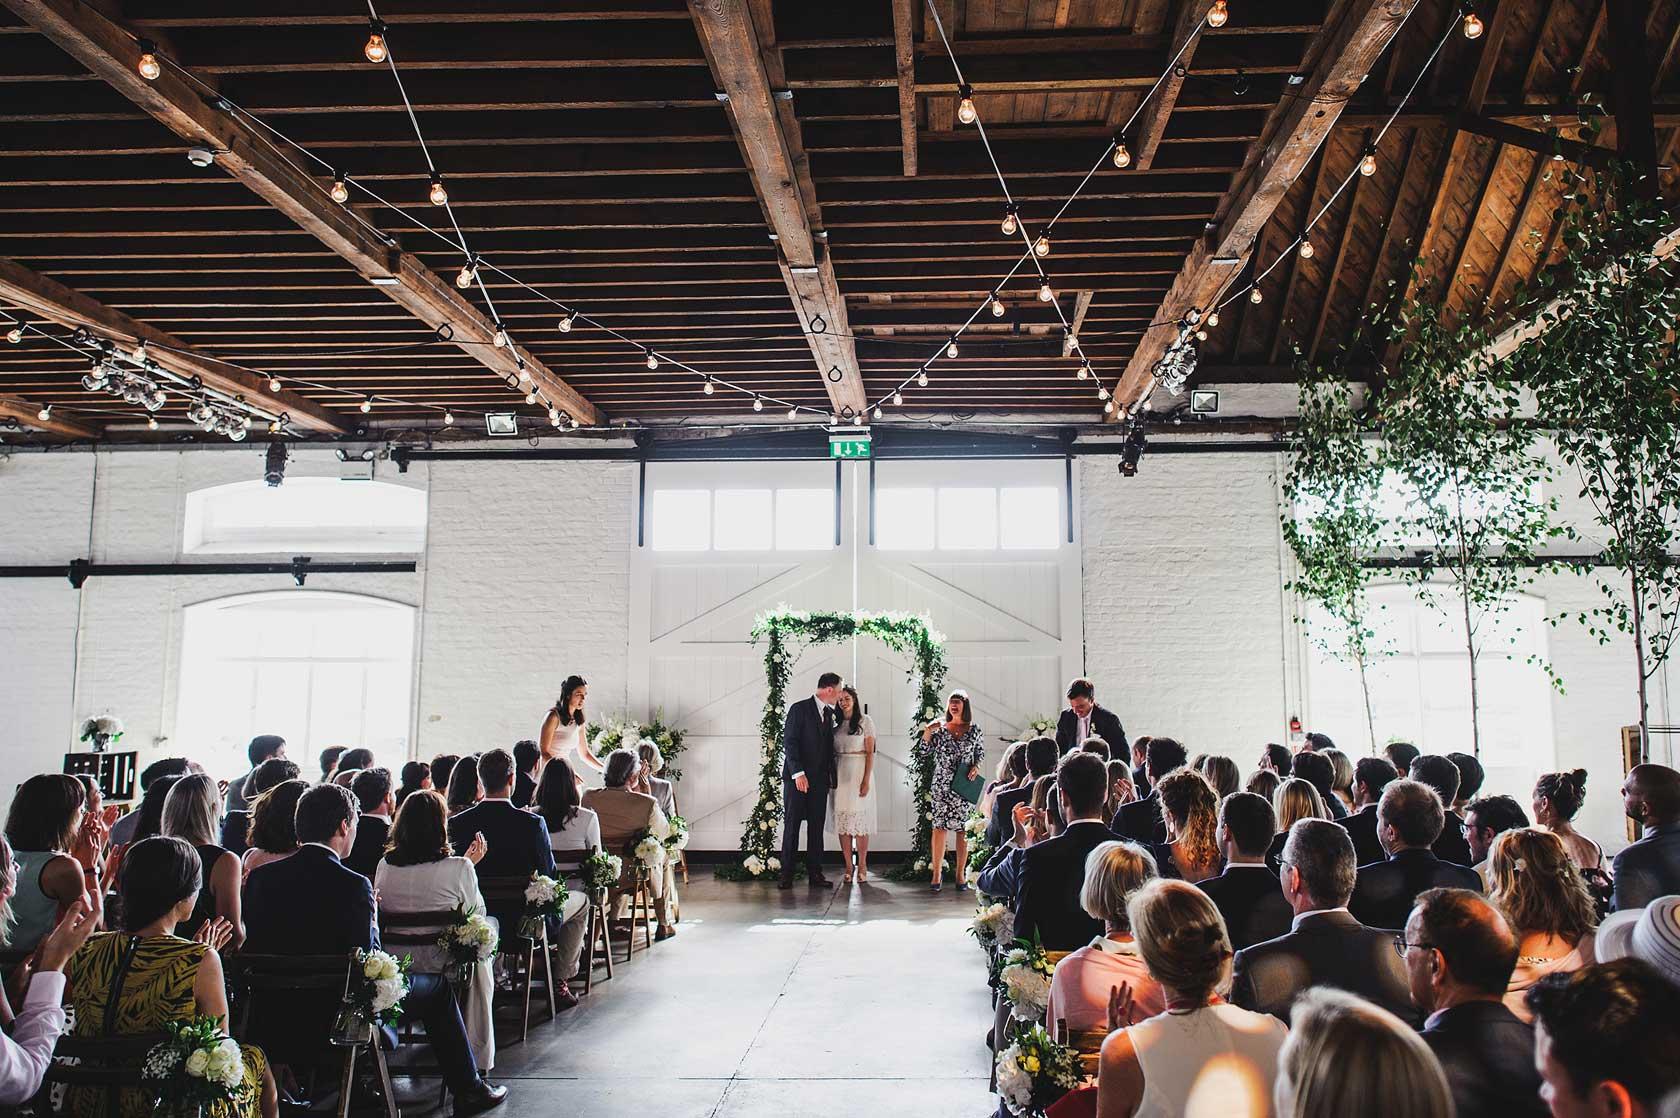 Reportage Wedding Photography at Trinity Buoy Wharf